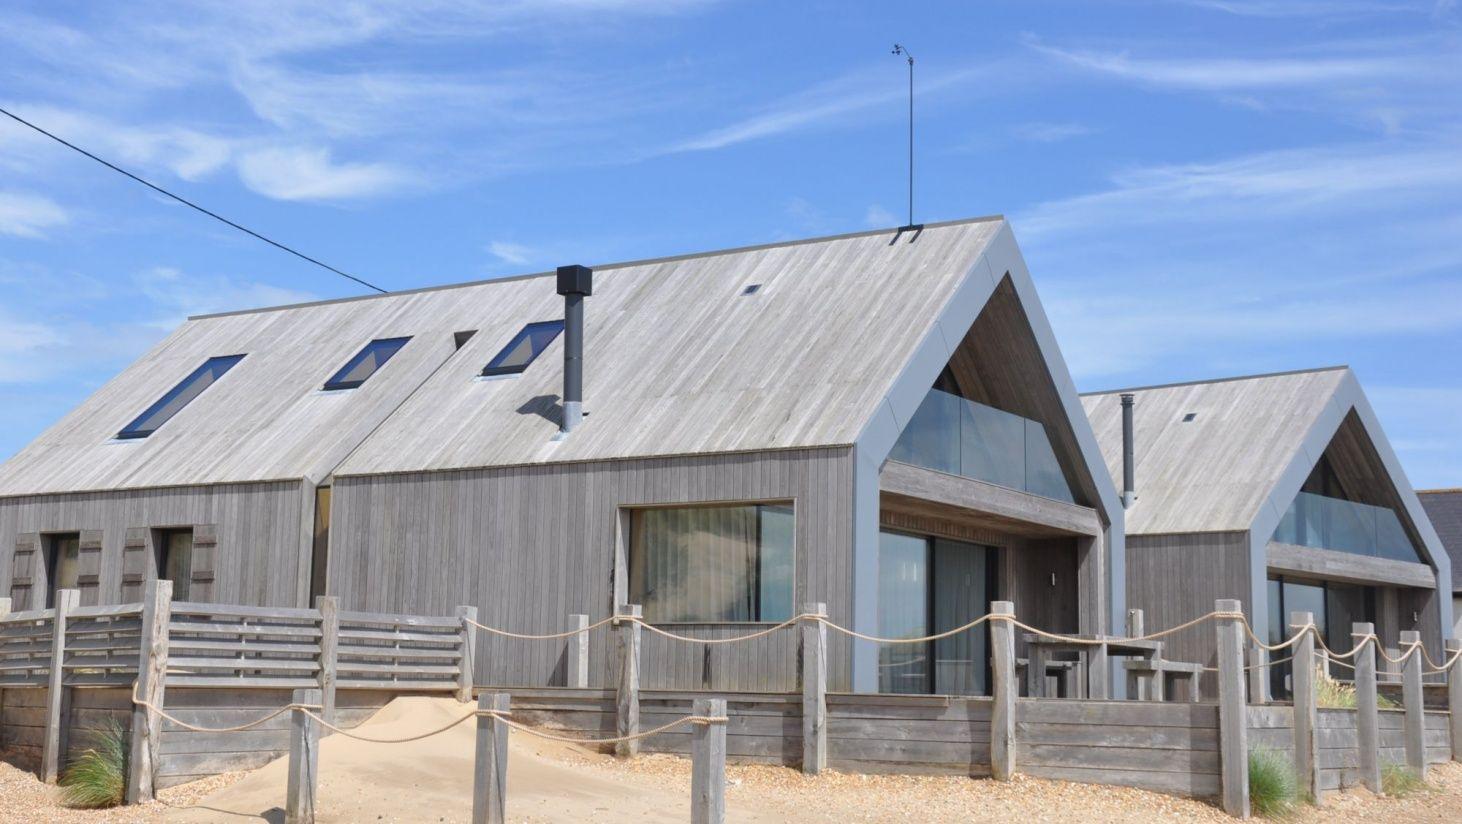 13 modern exterior cladding ideas kebony exterior on modern house designs siding that look amazing id=78304